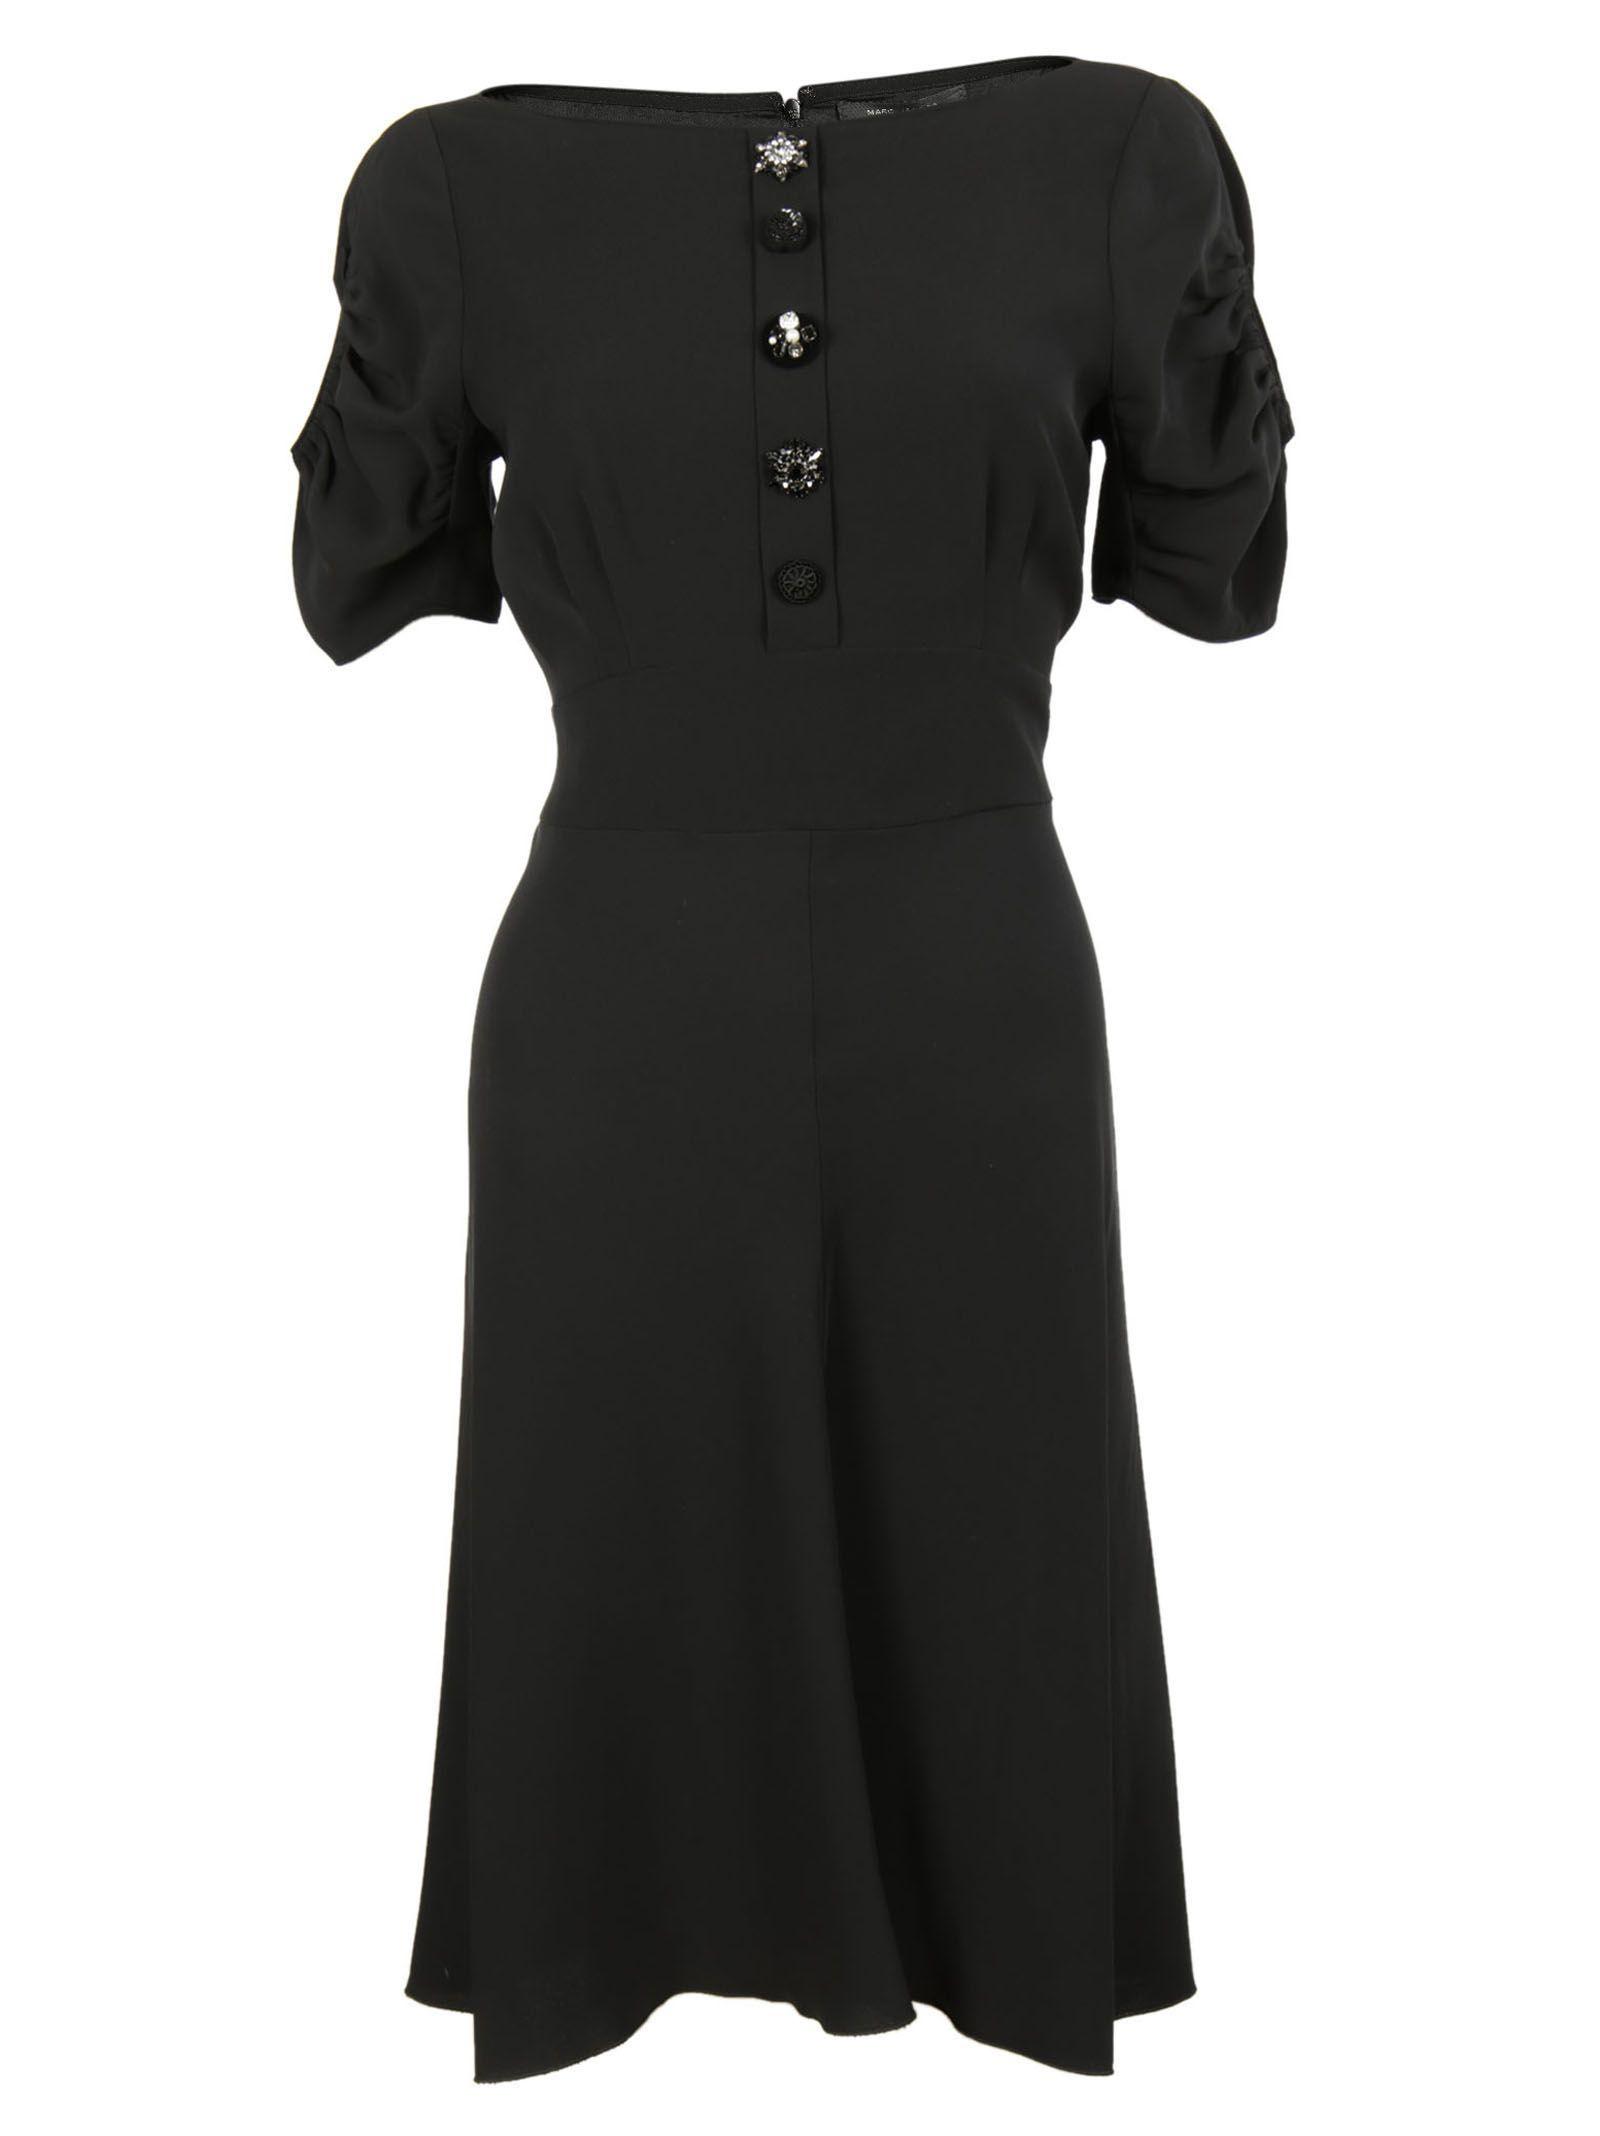 marc jacobs female 188971 black jewel button dress